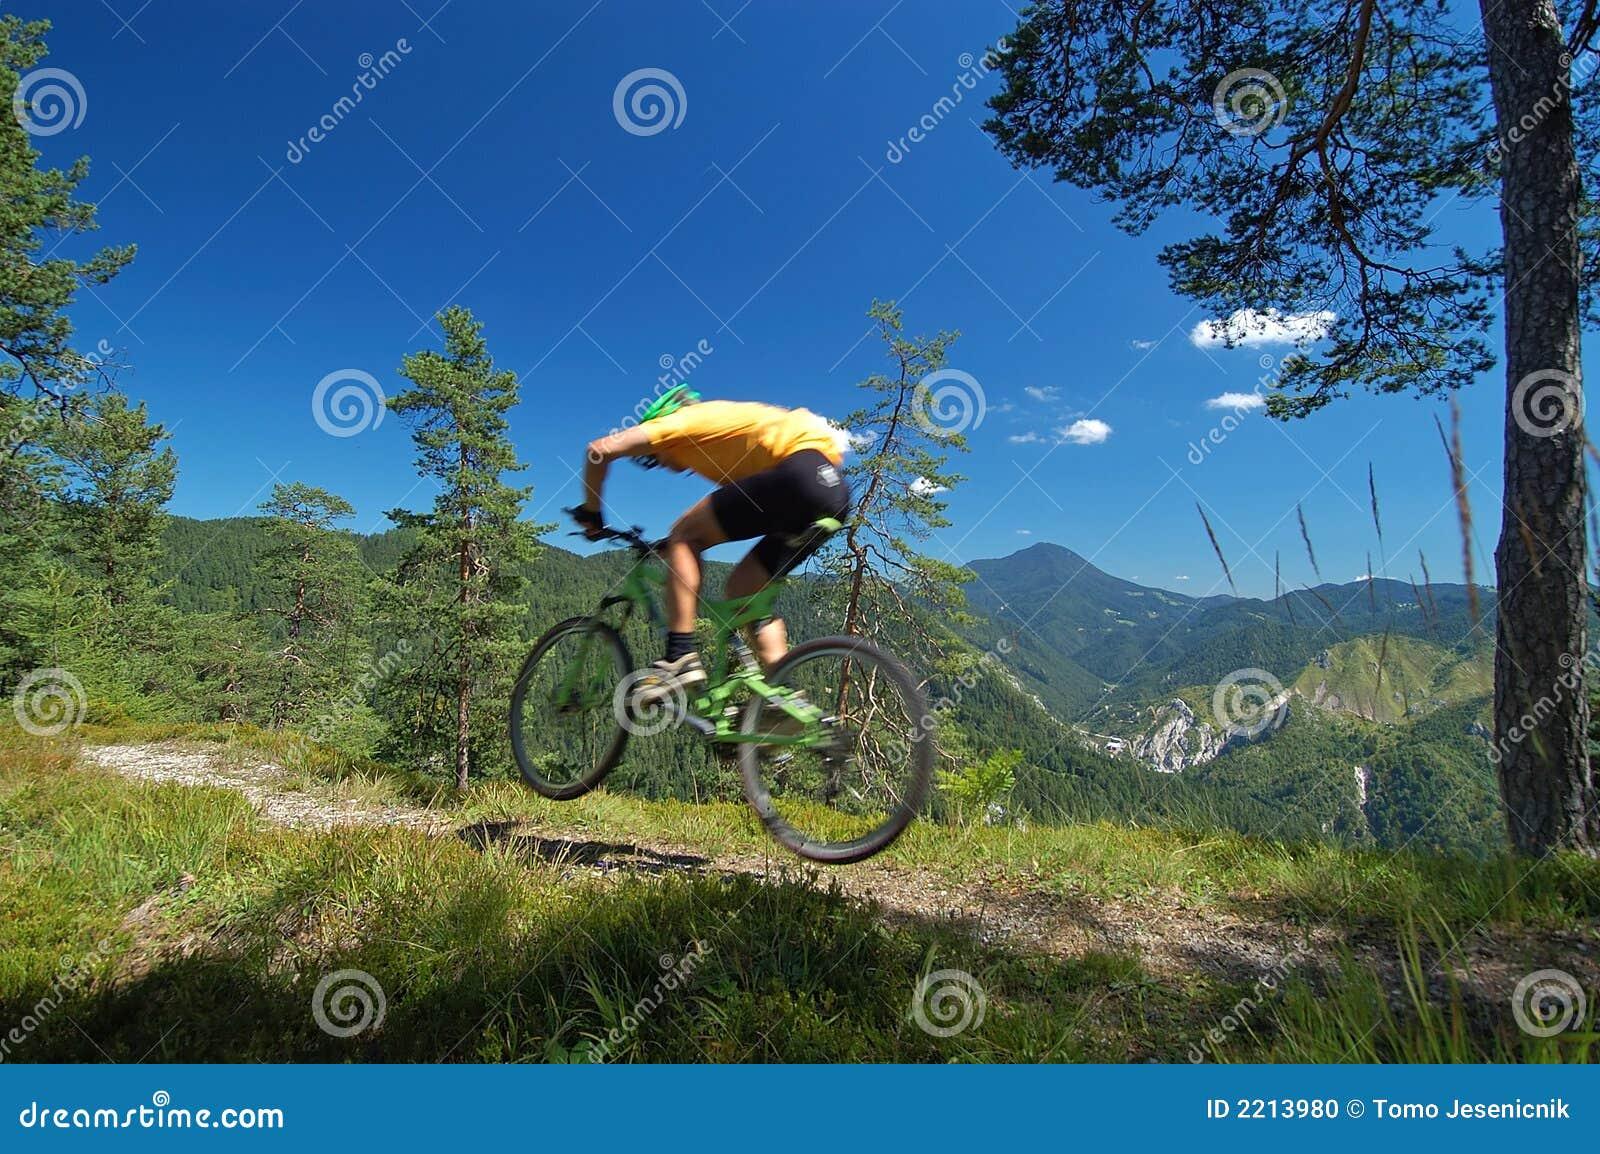 Mountainbikers jump